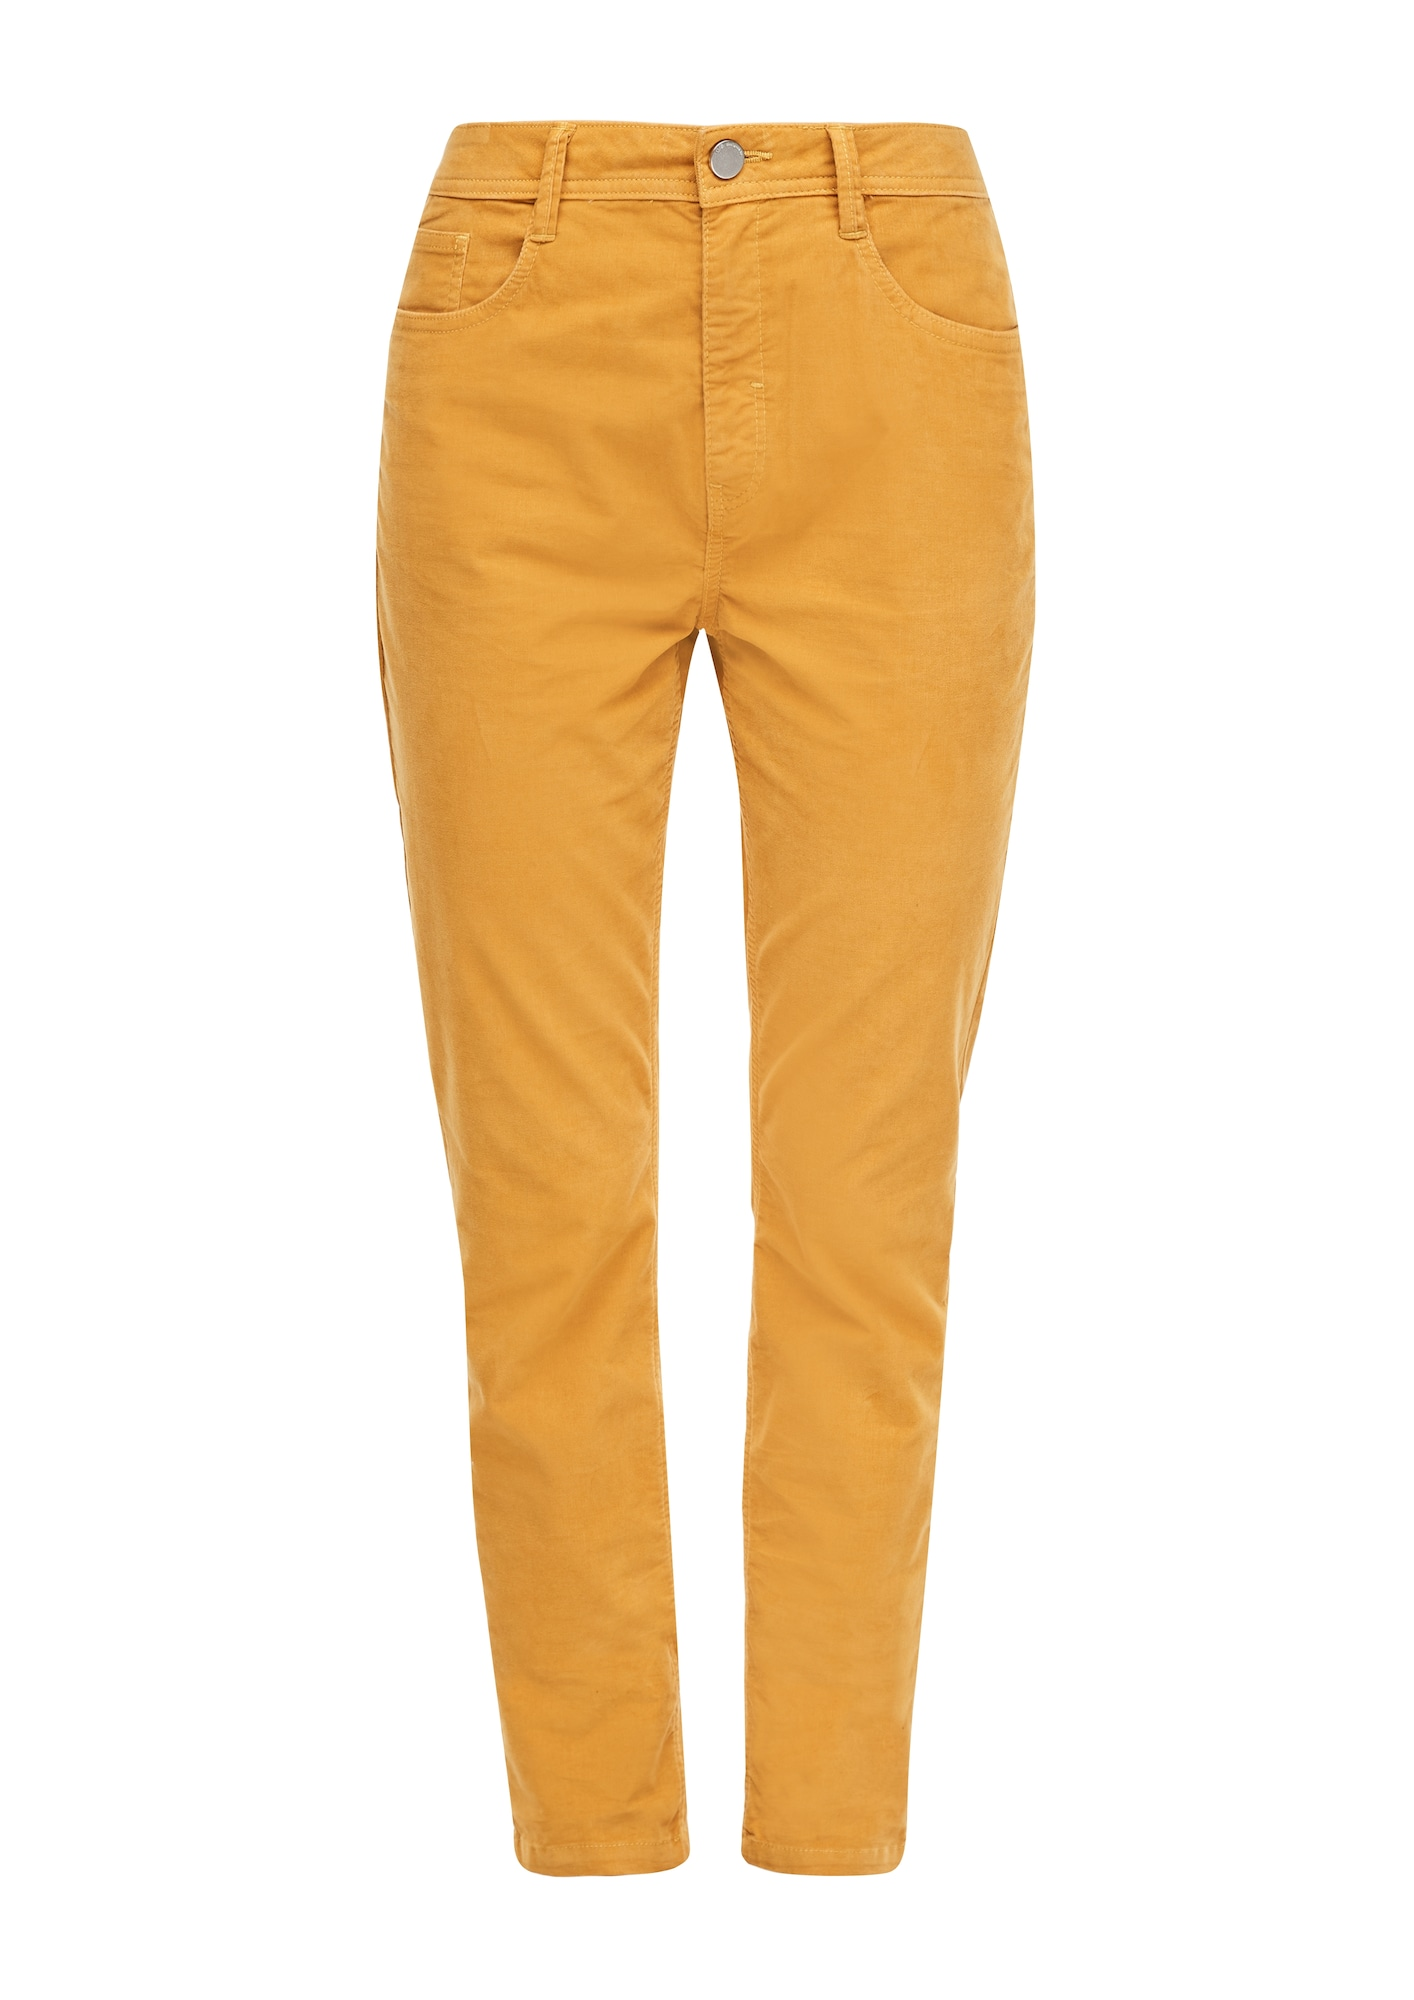 Q/S designed by Kelnės geltona